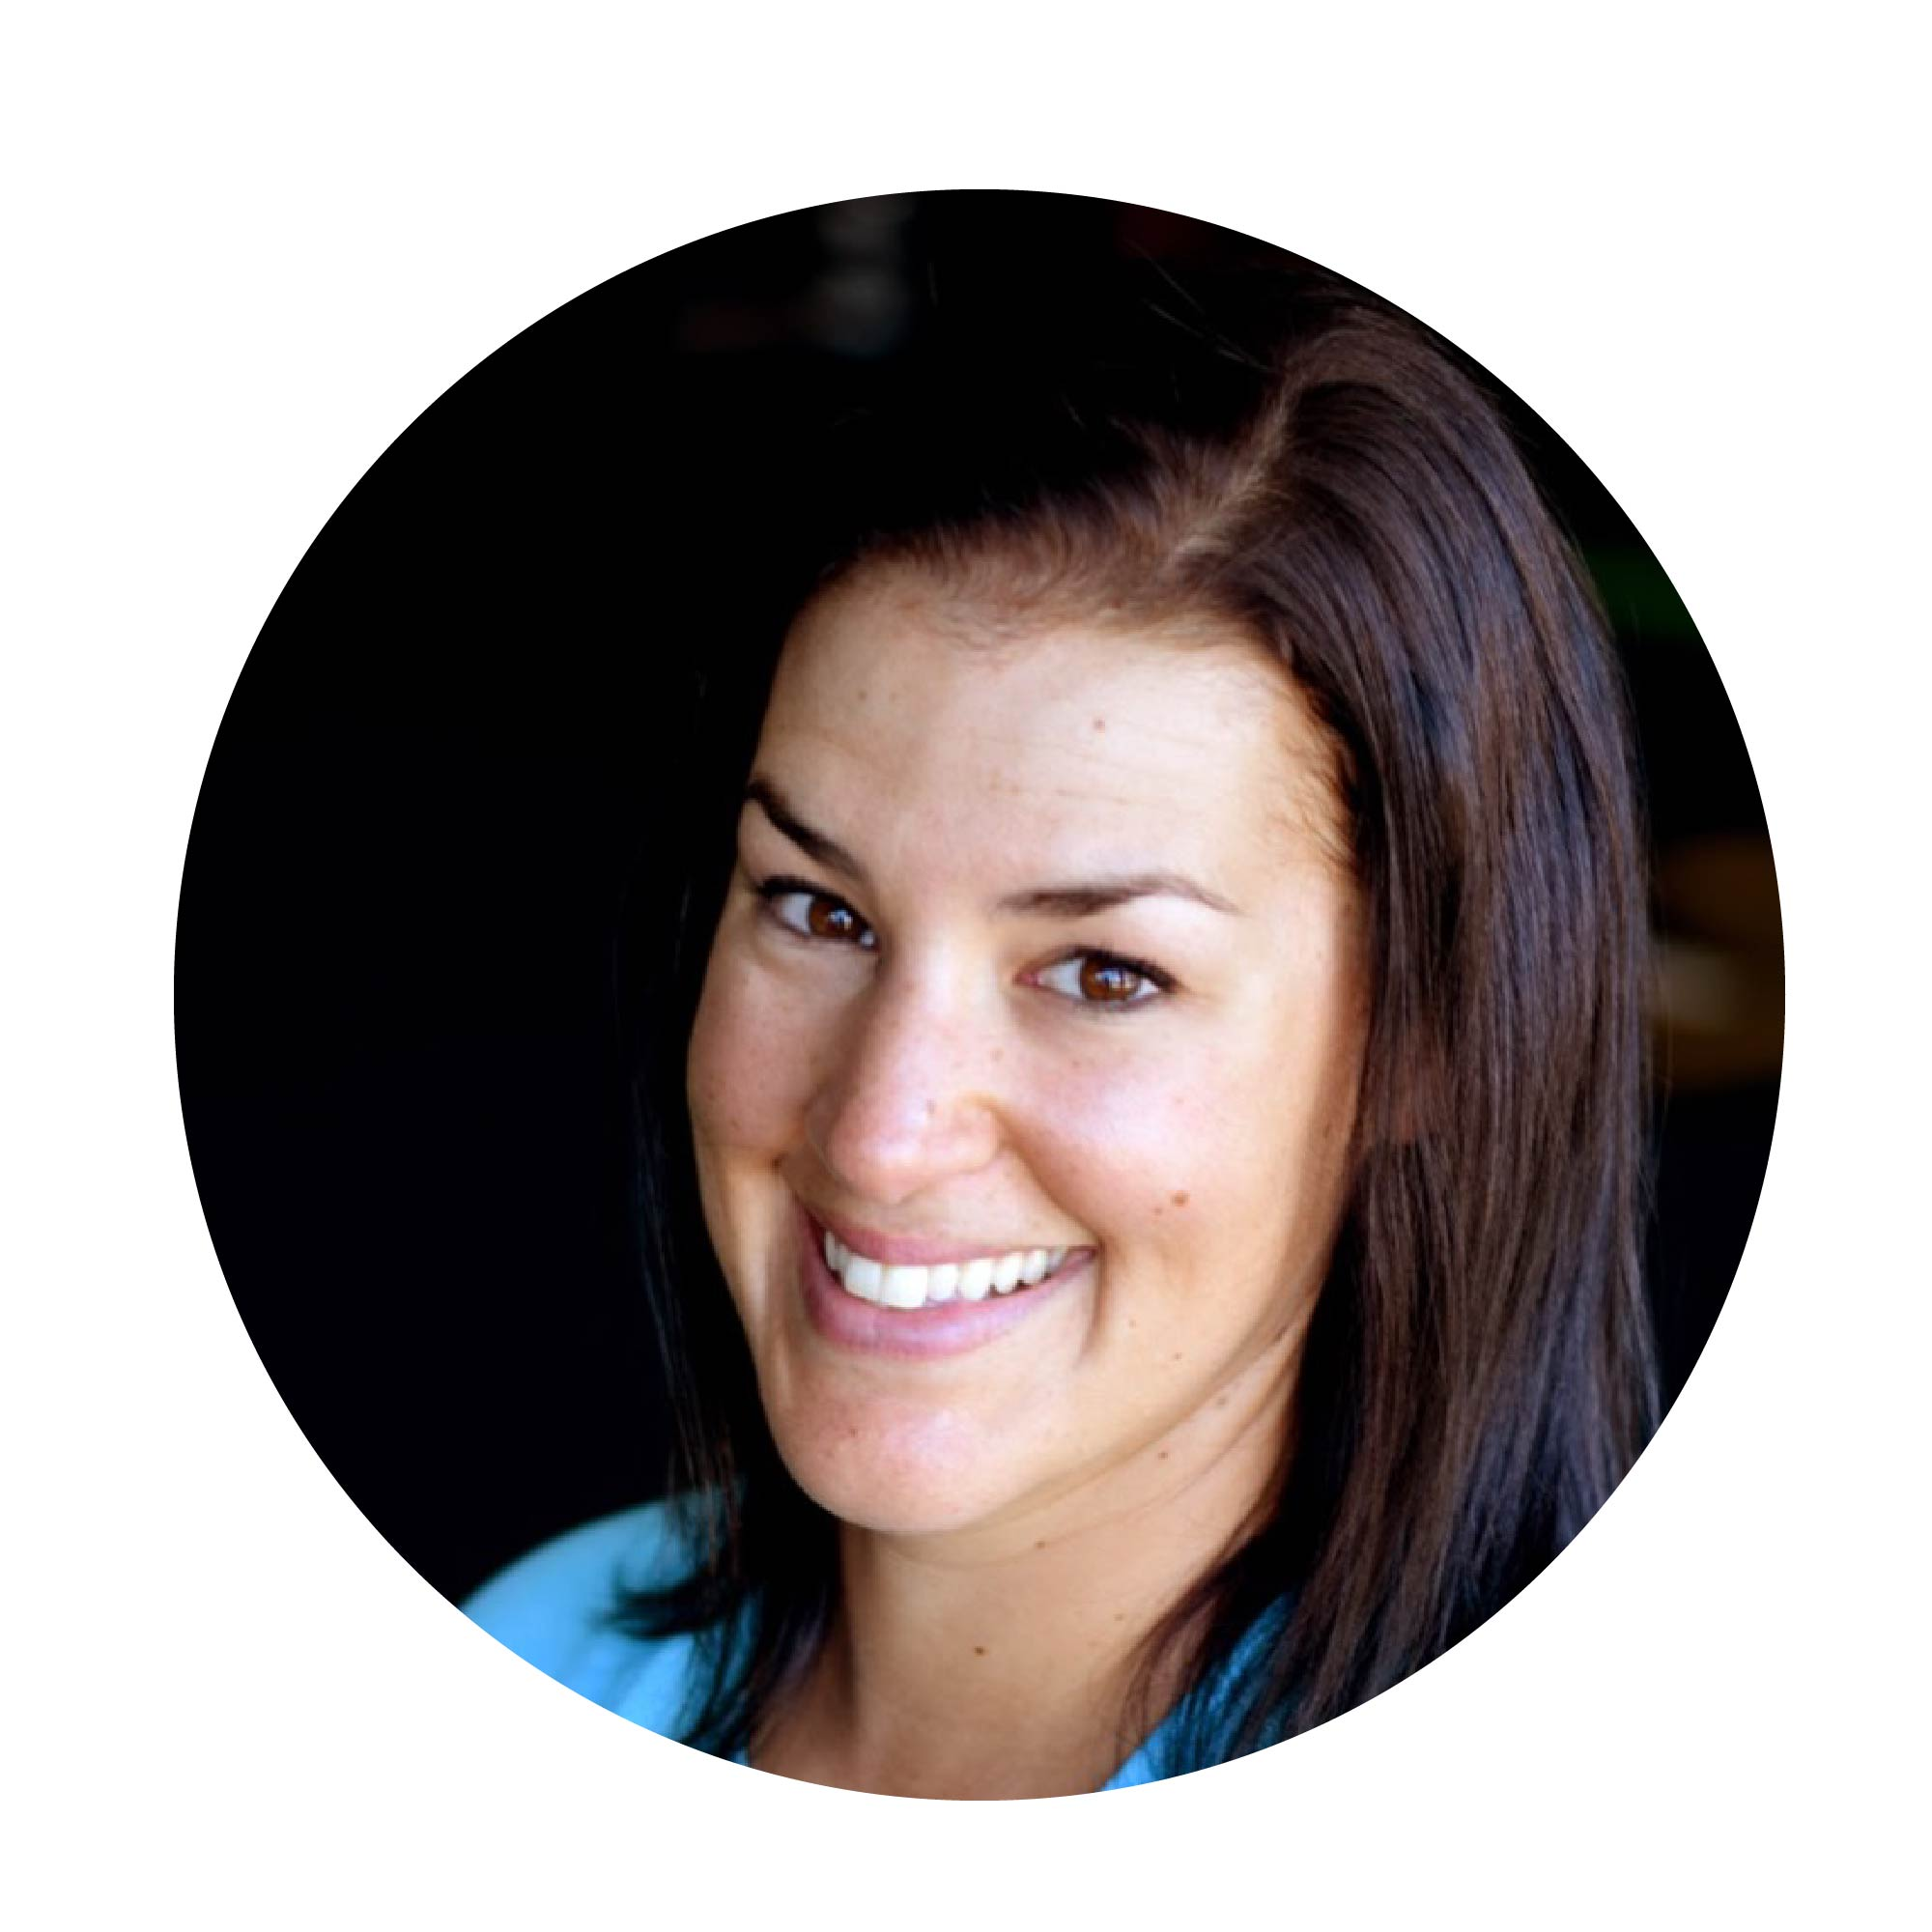 joanna zervas (accredited exercise physiologist @ balanced posture online) -